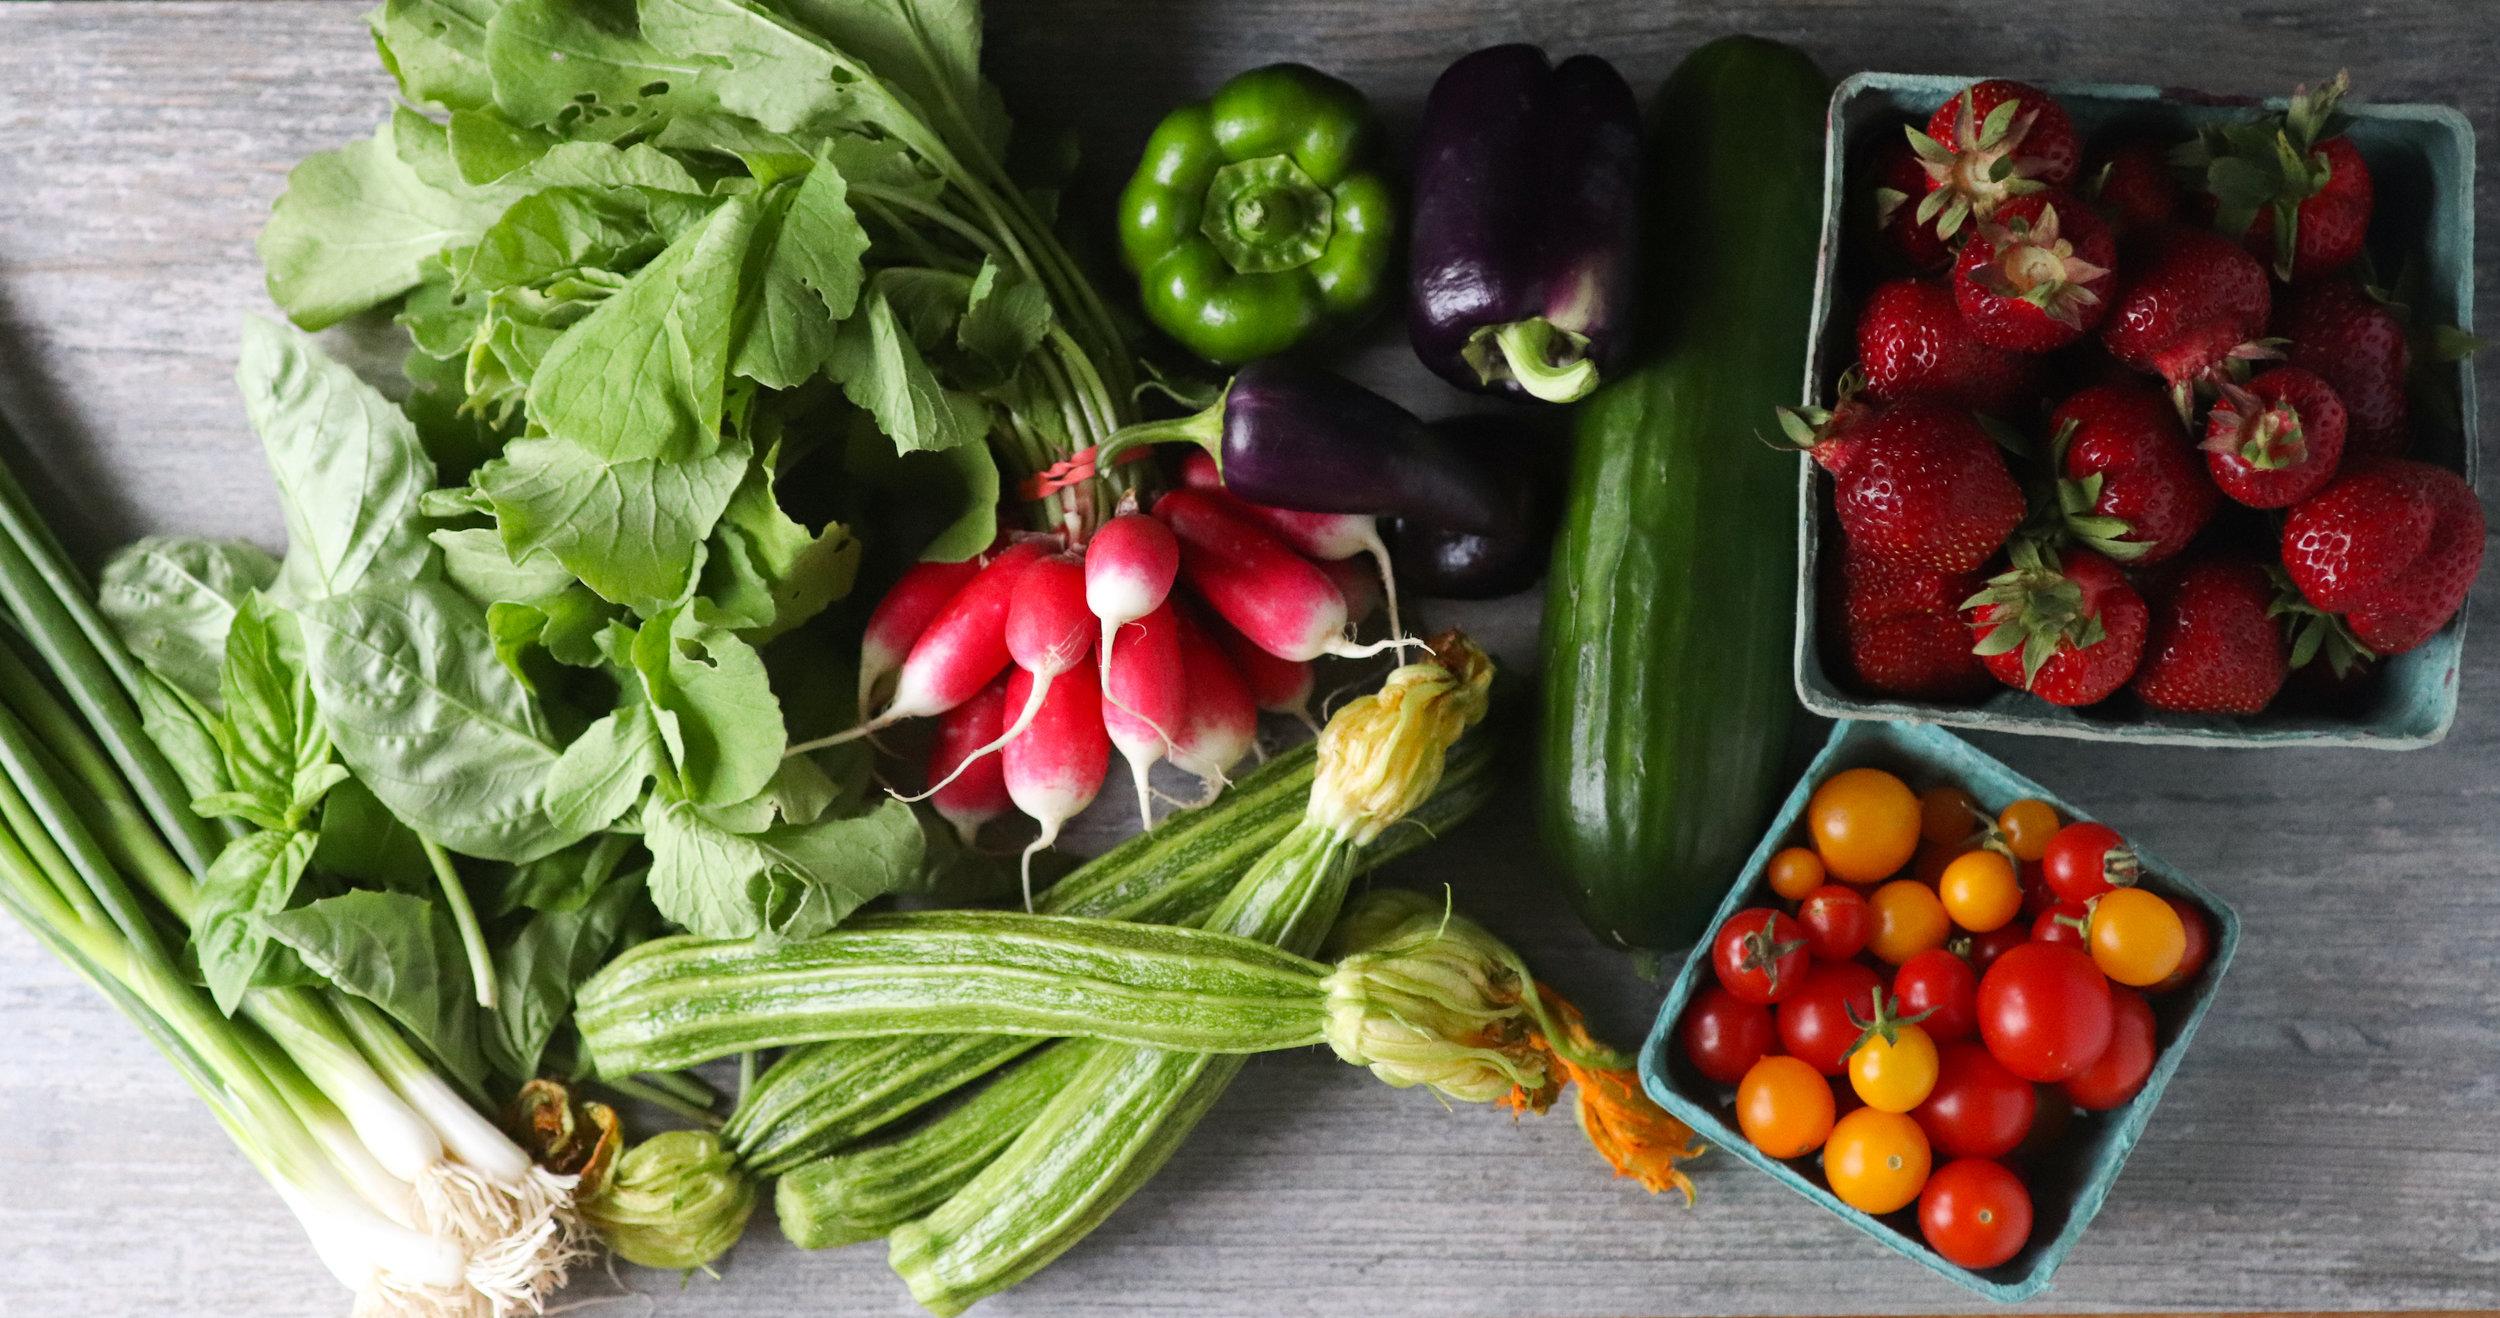 market haul, early summer, summer quinoa salad, tomatoes, vegan, gluten free, fresh, produce, summer